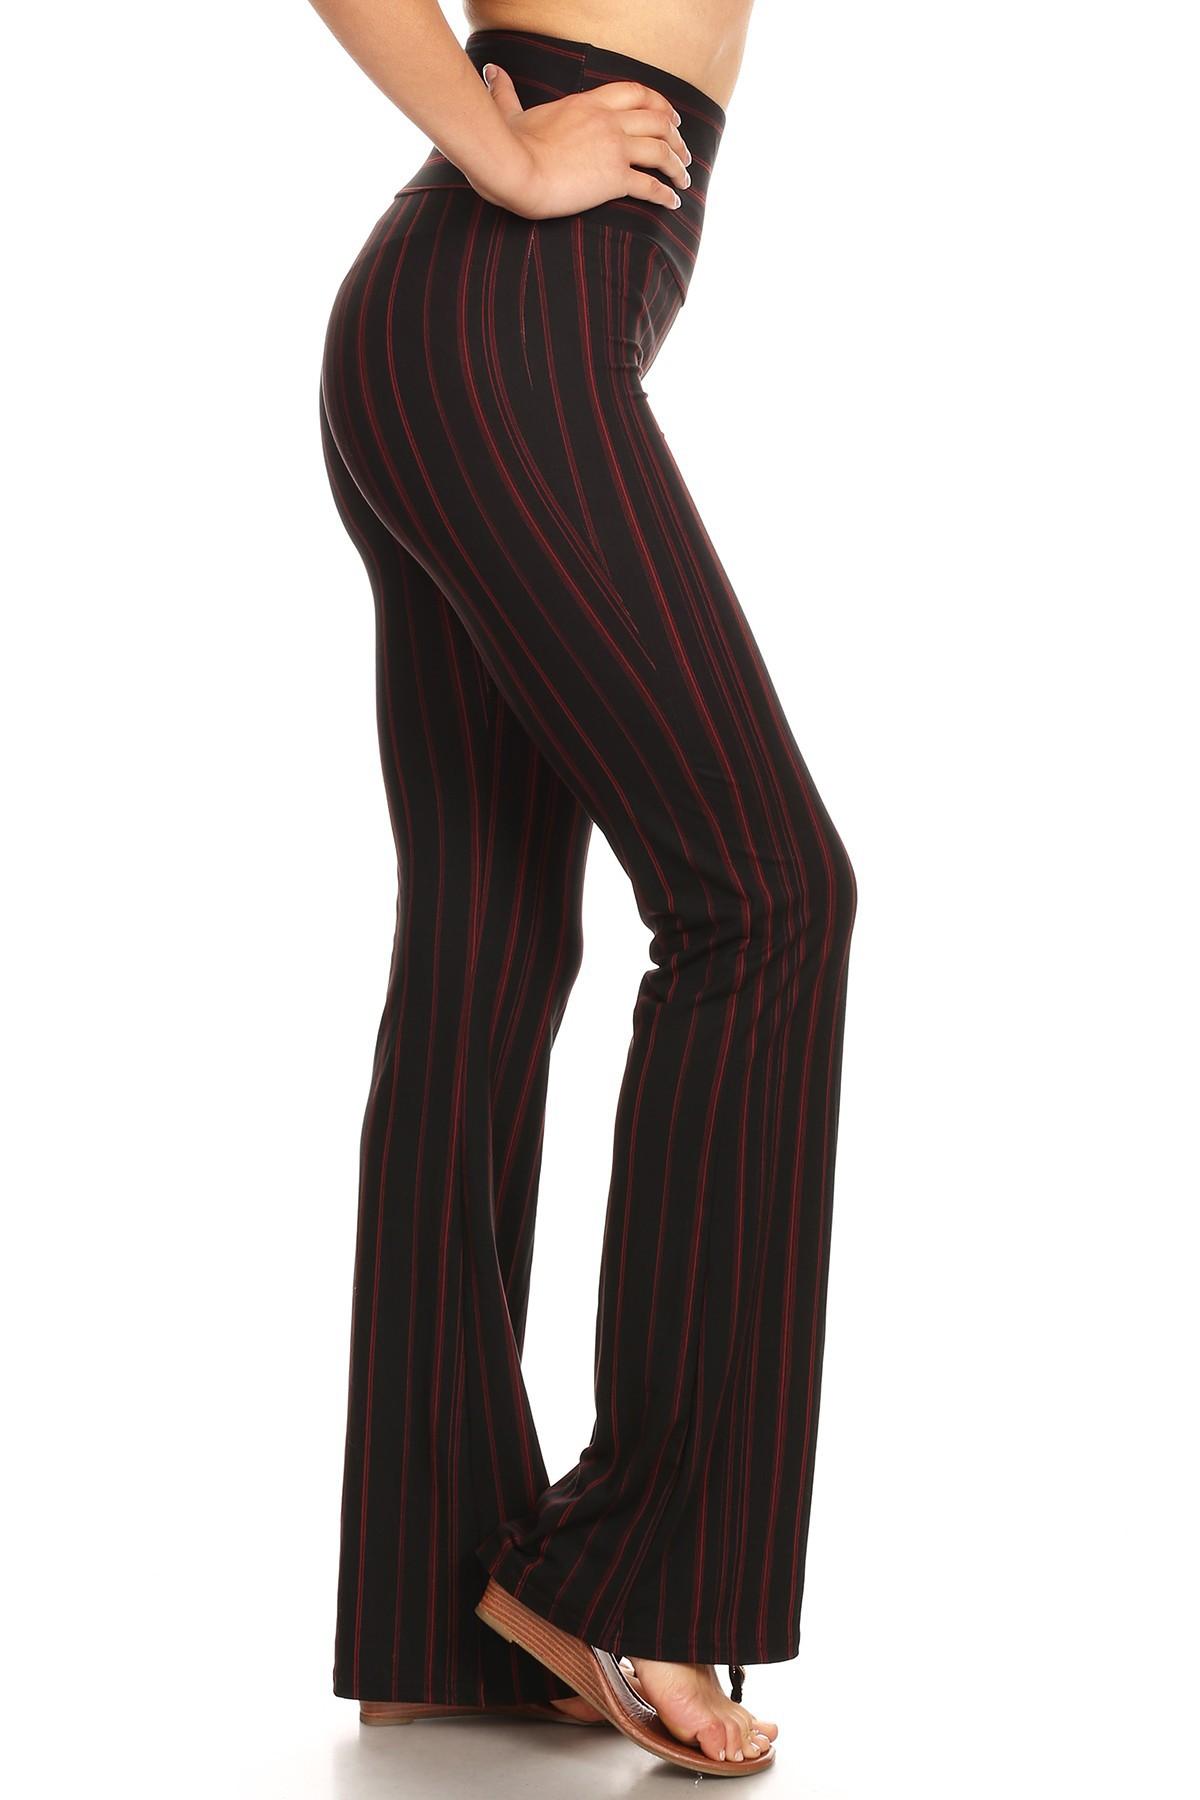 BLACK/RED STRIPE PRINT HIGH WAIST BRUSH POLY FLARE PANTS#8FP06-01